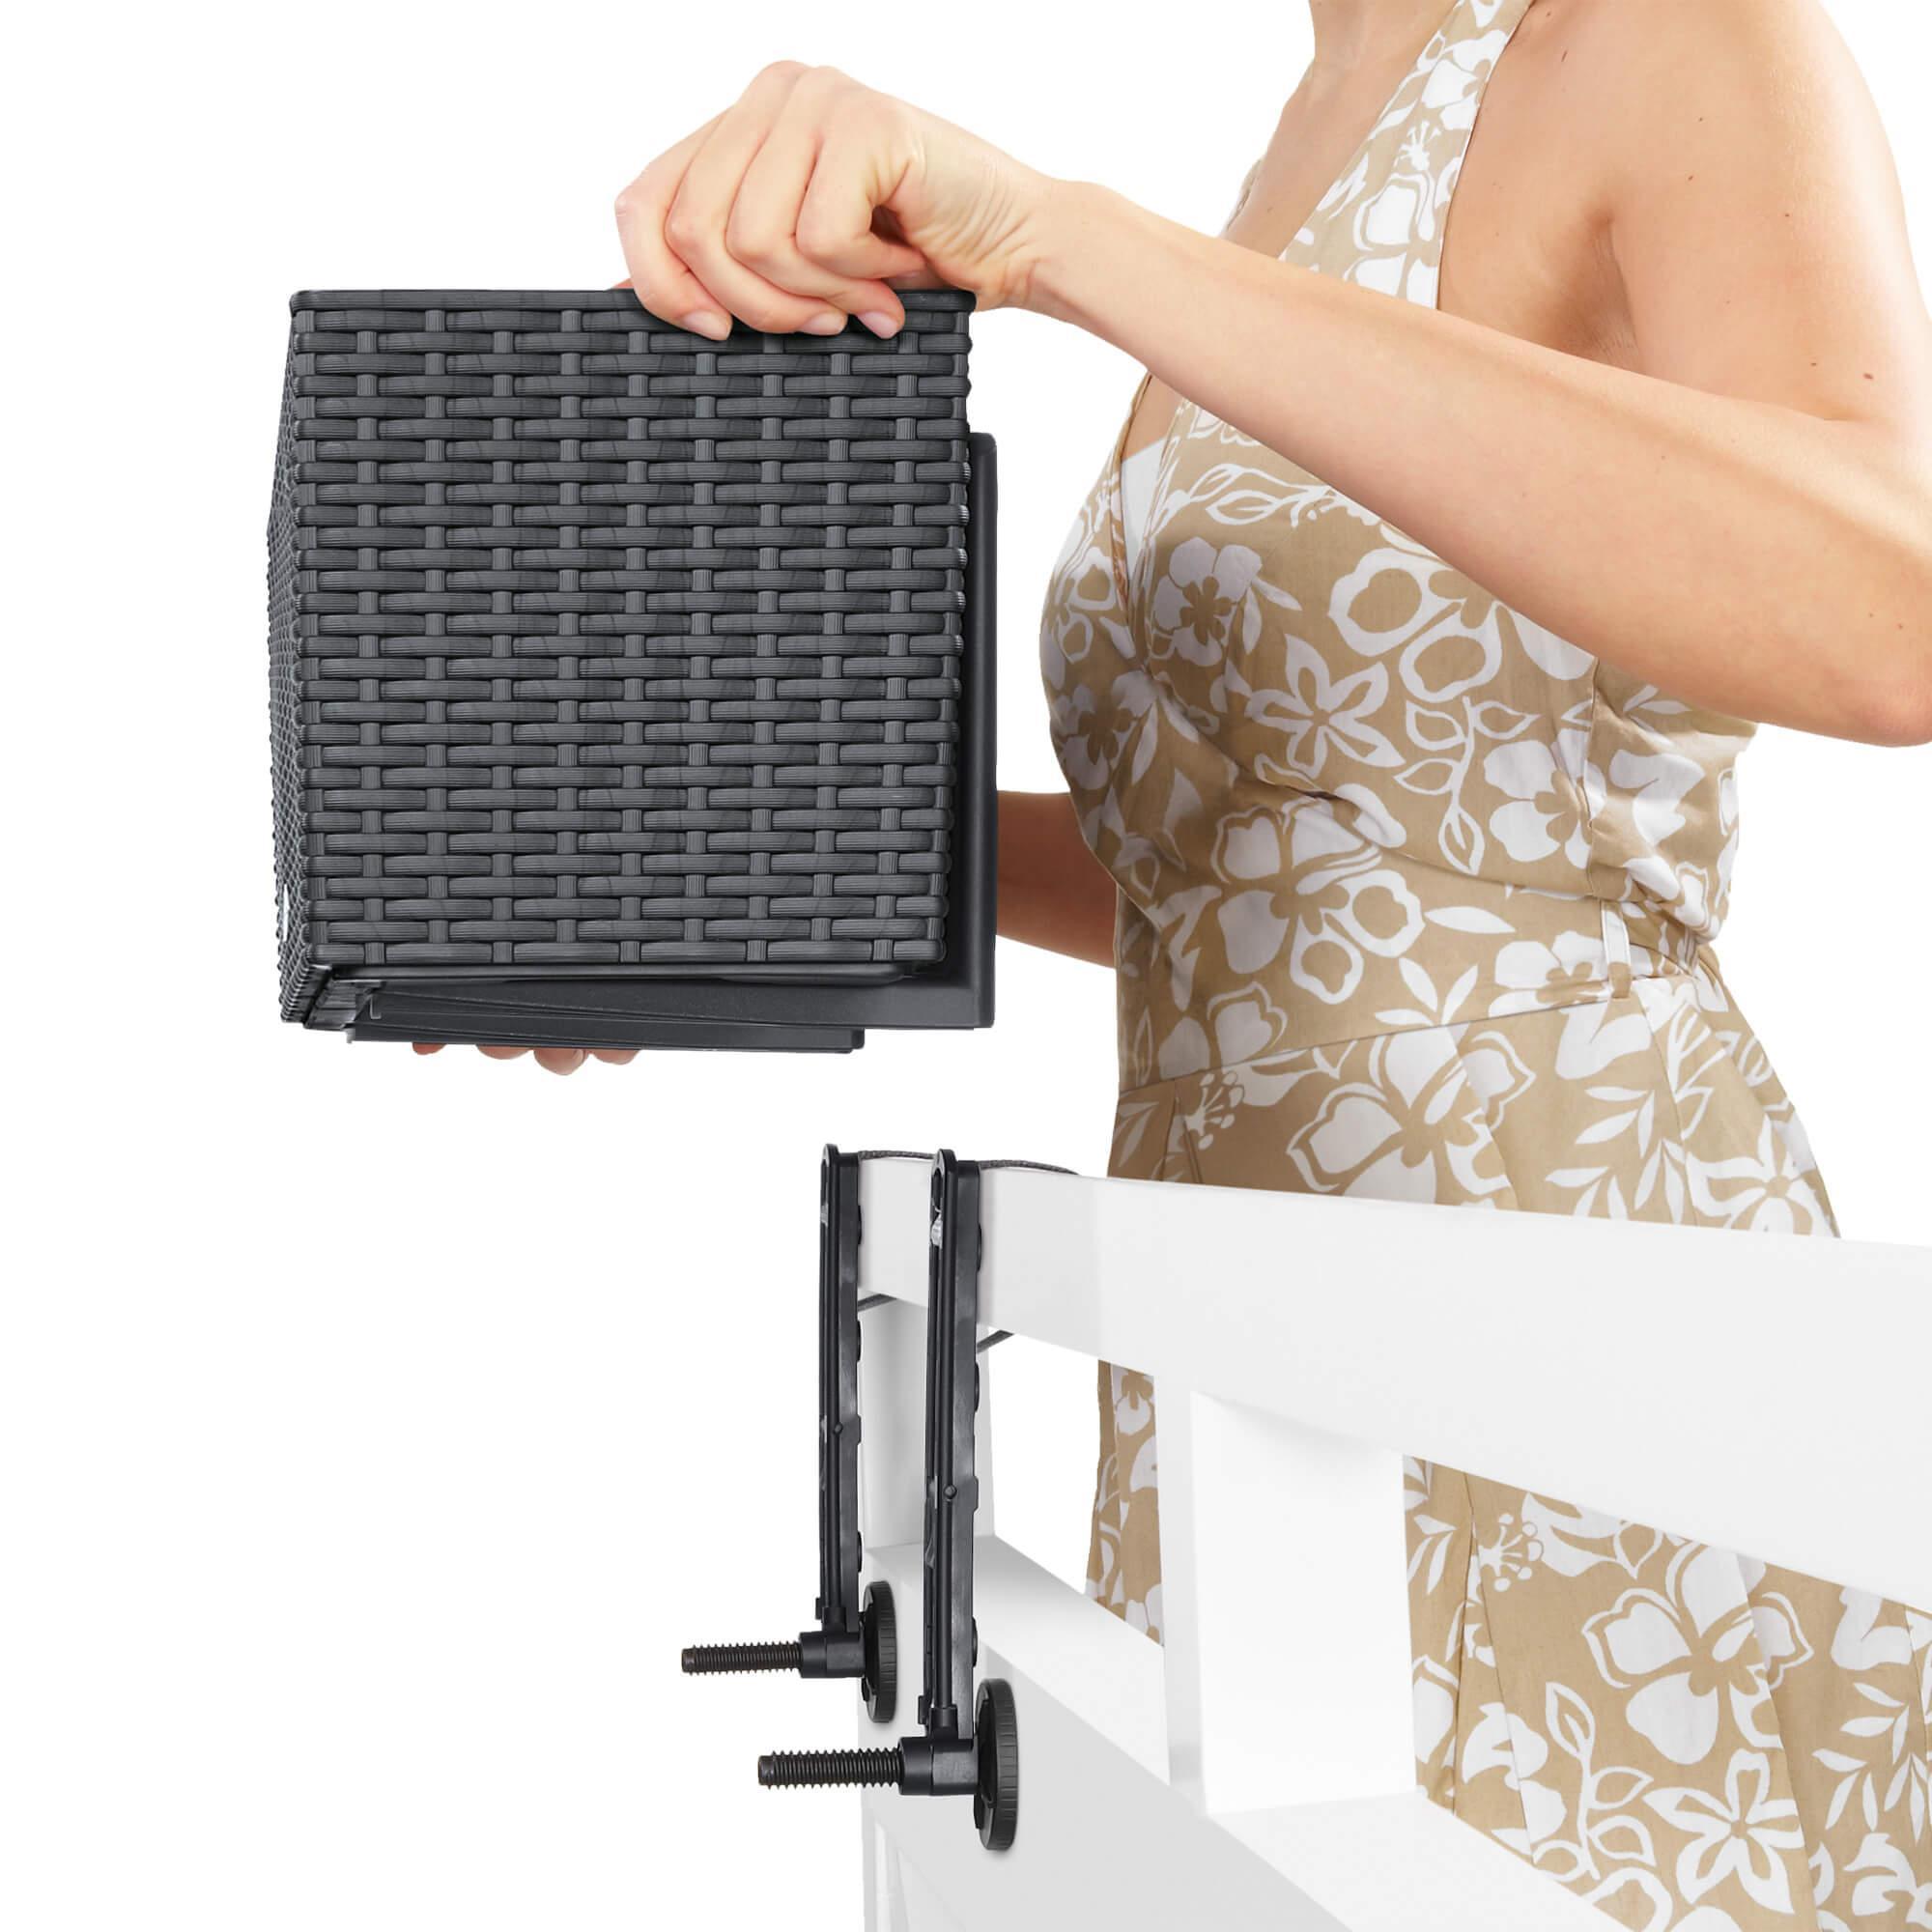 le_balkonkastenhalter-balconera_product_addi_04